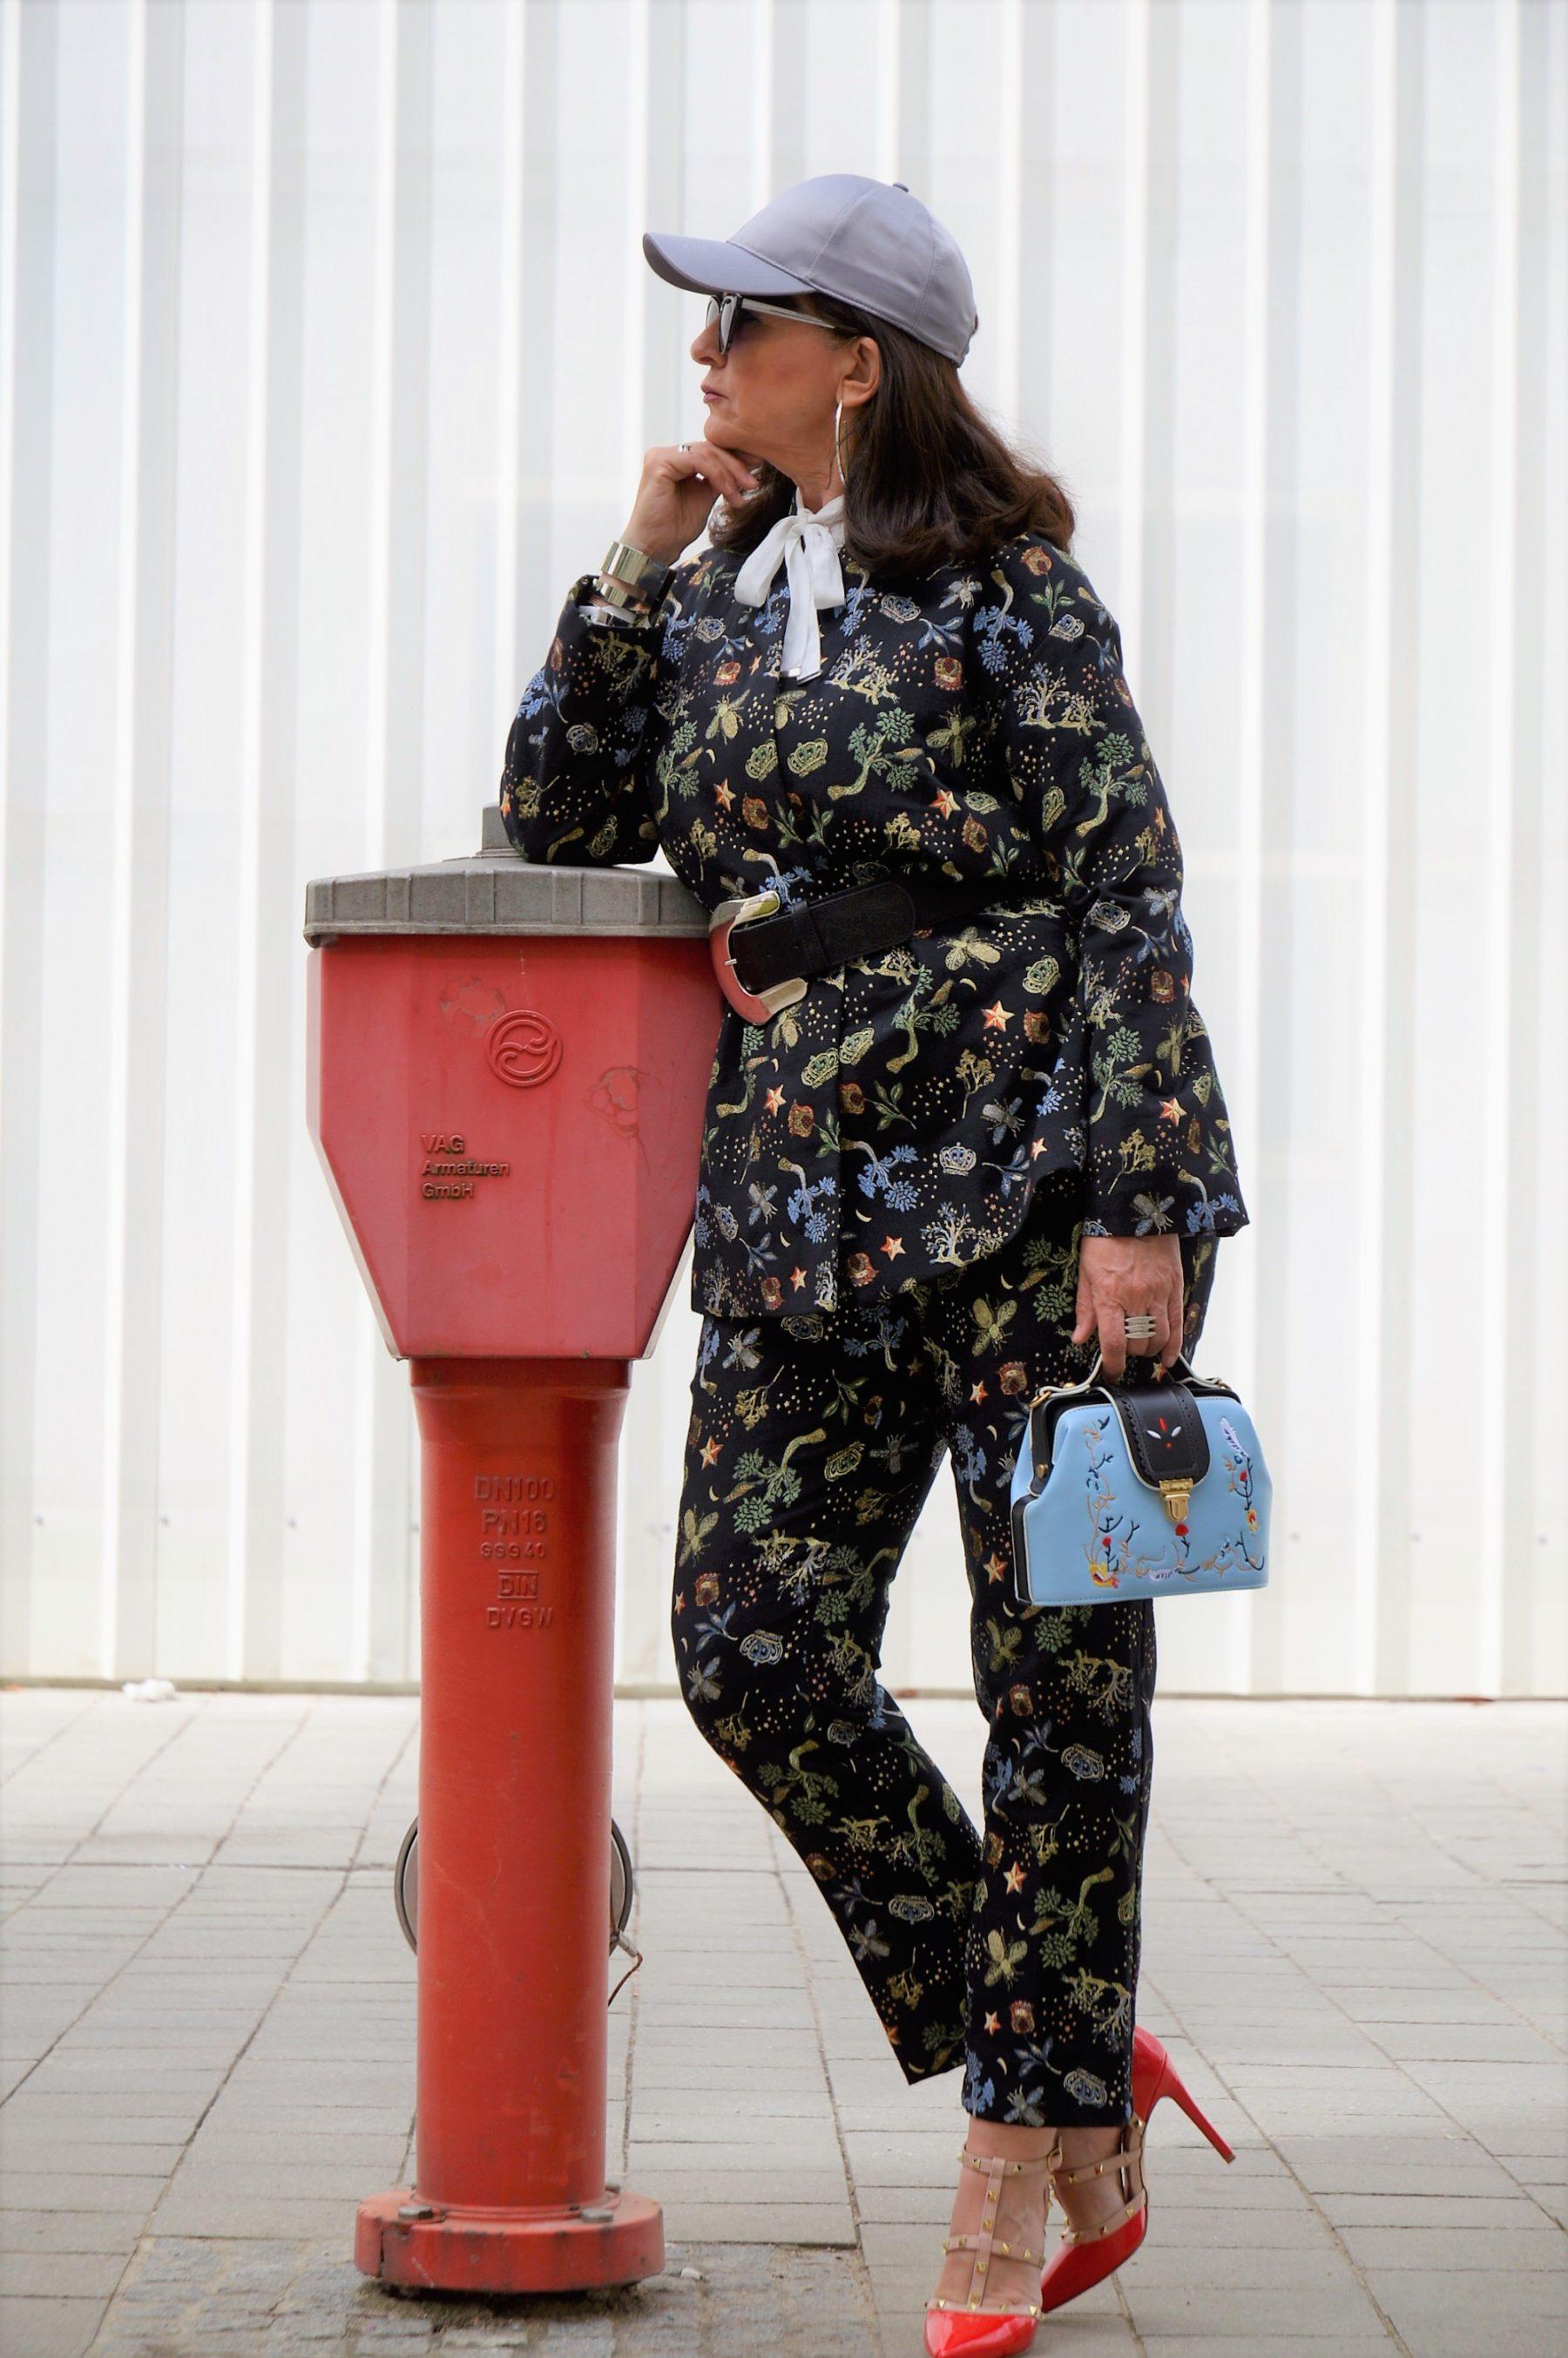 Fashion over 50 Lady 50plus